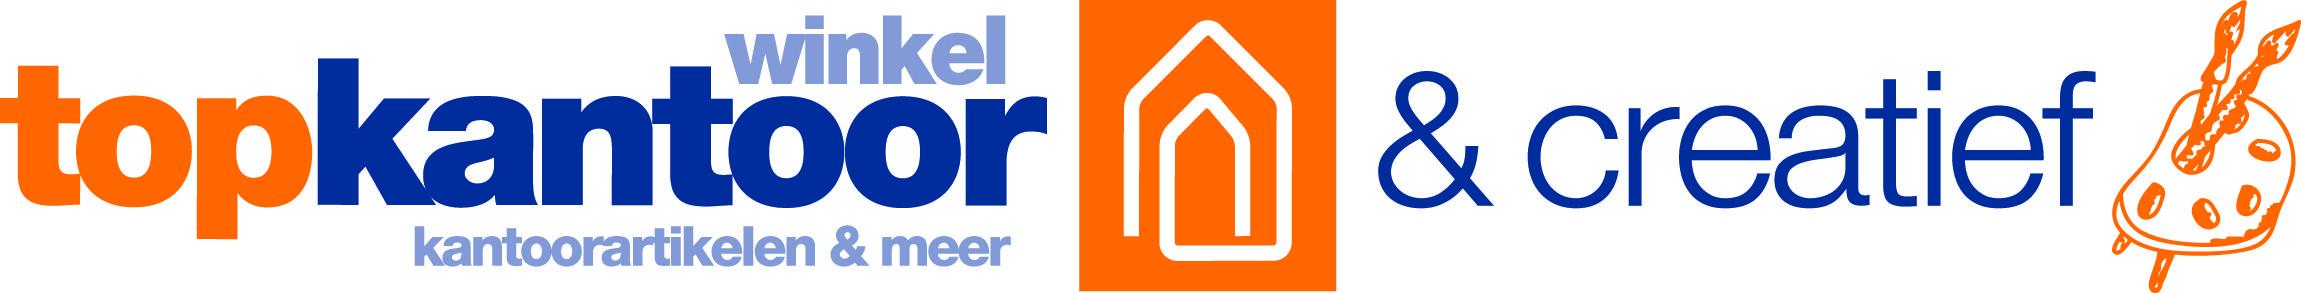 Topkantoor logo kluisverhuur regio 't gooi